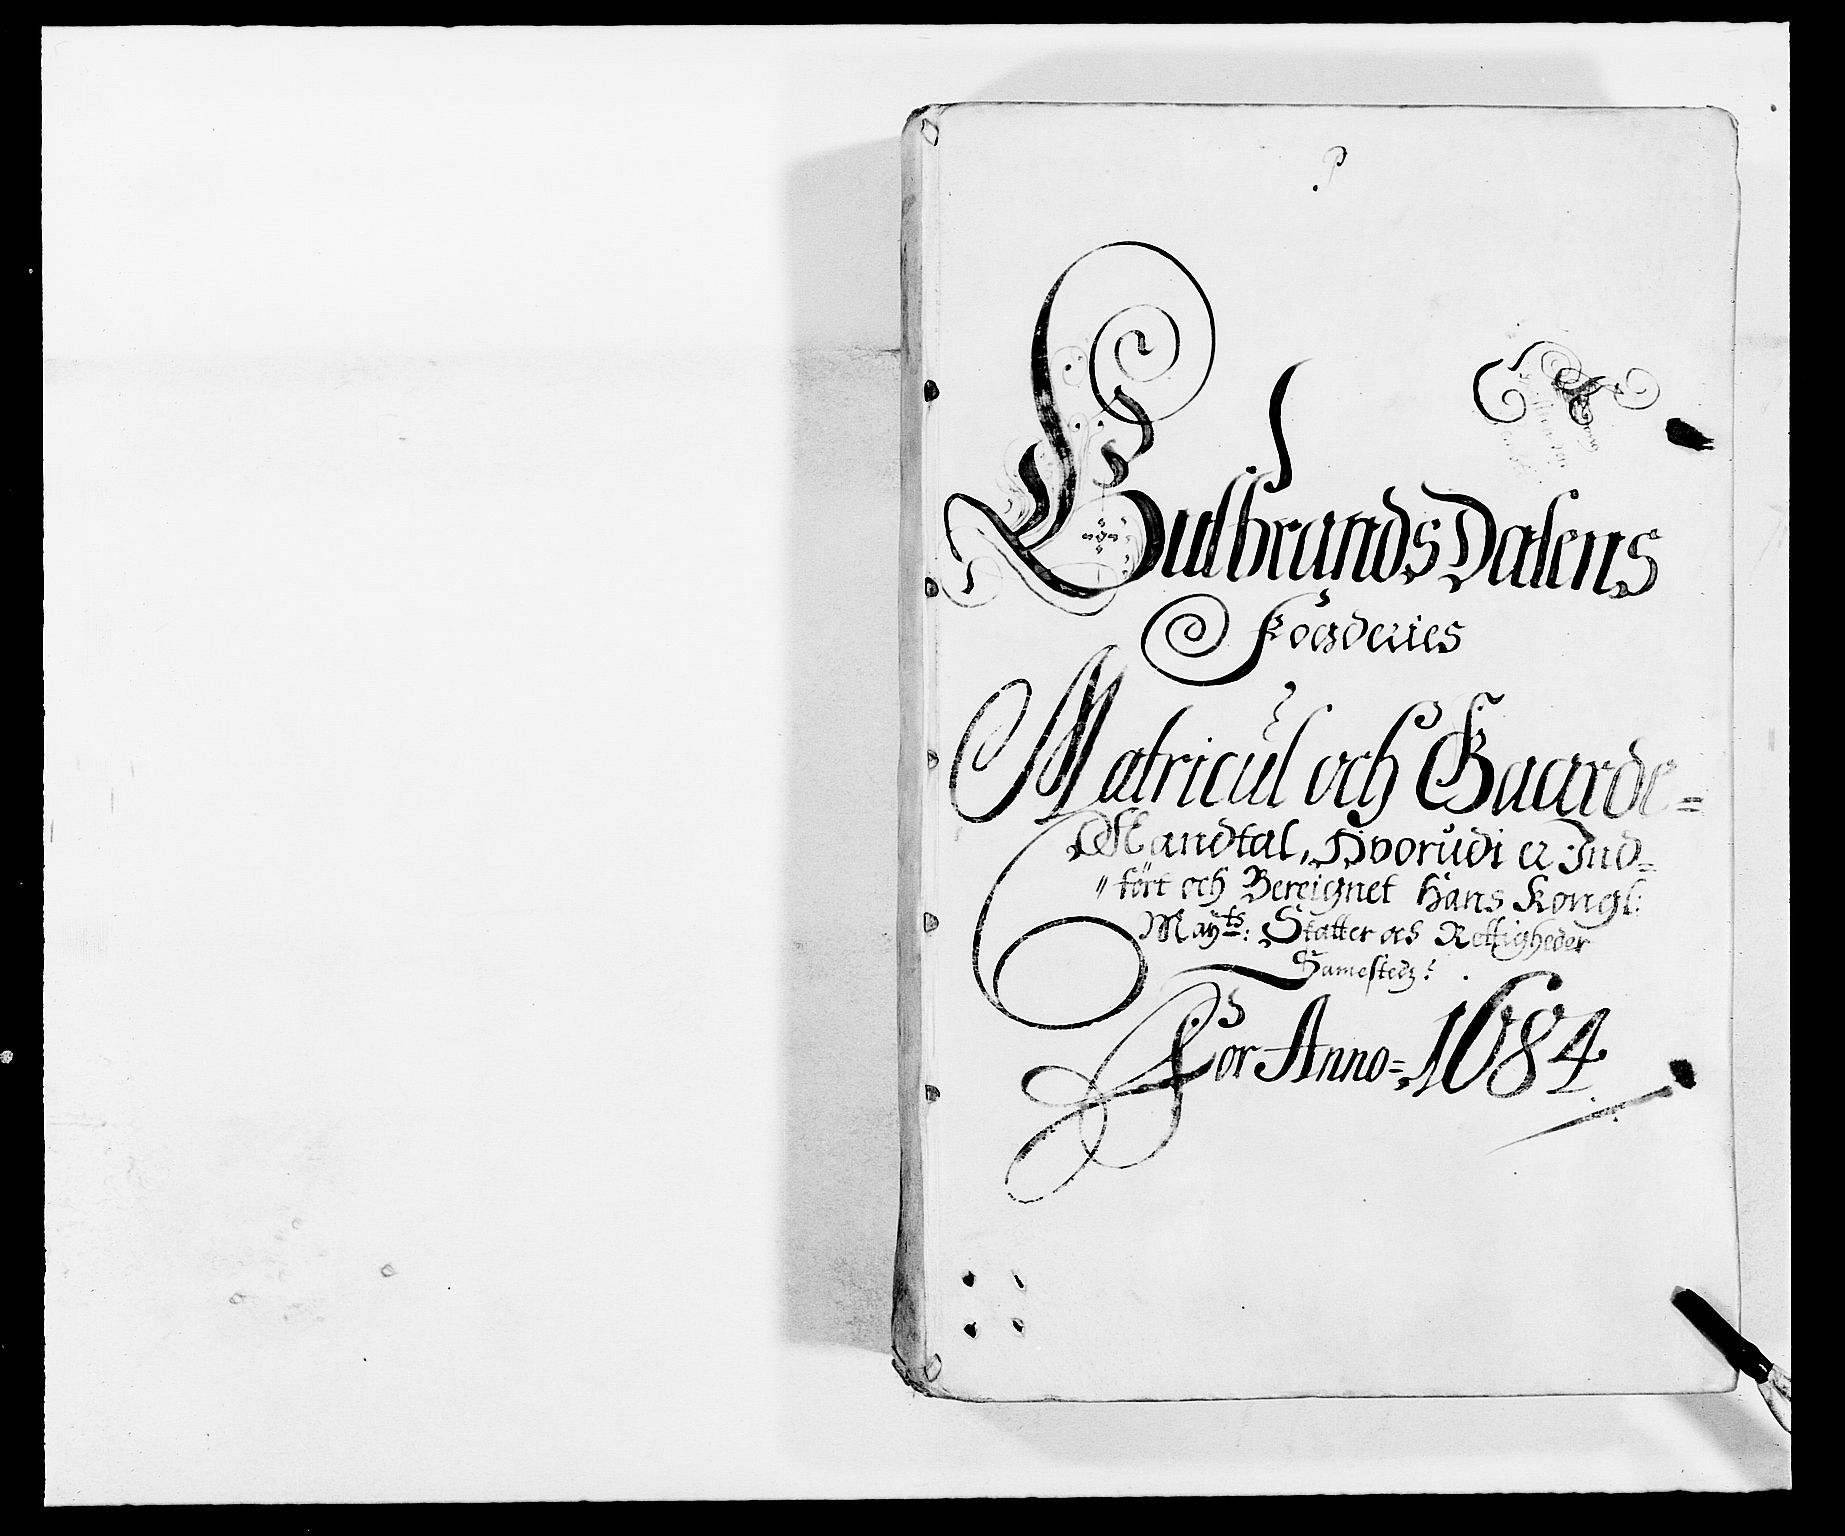 RA, Rentekammeret inntil 1814, Reviderte regnskaper, Fogderegnskap, R17/L1159: Fogderegnskap Gudbrandsdal, 1682-1689, s. 67